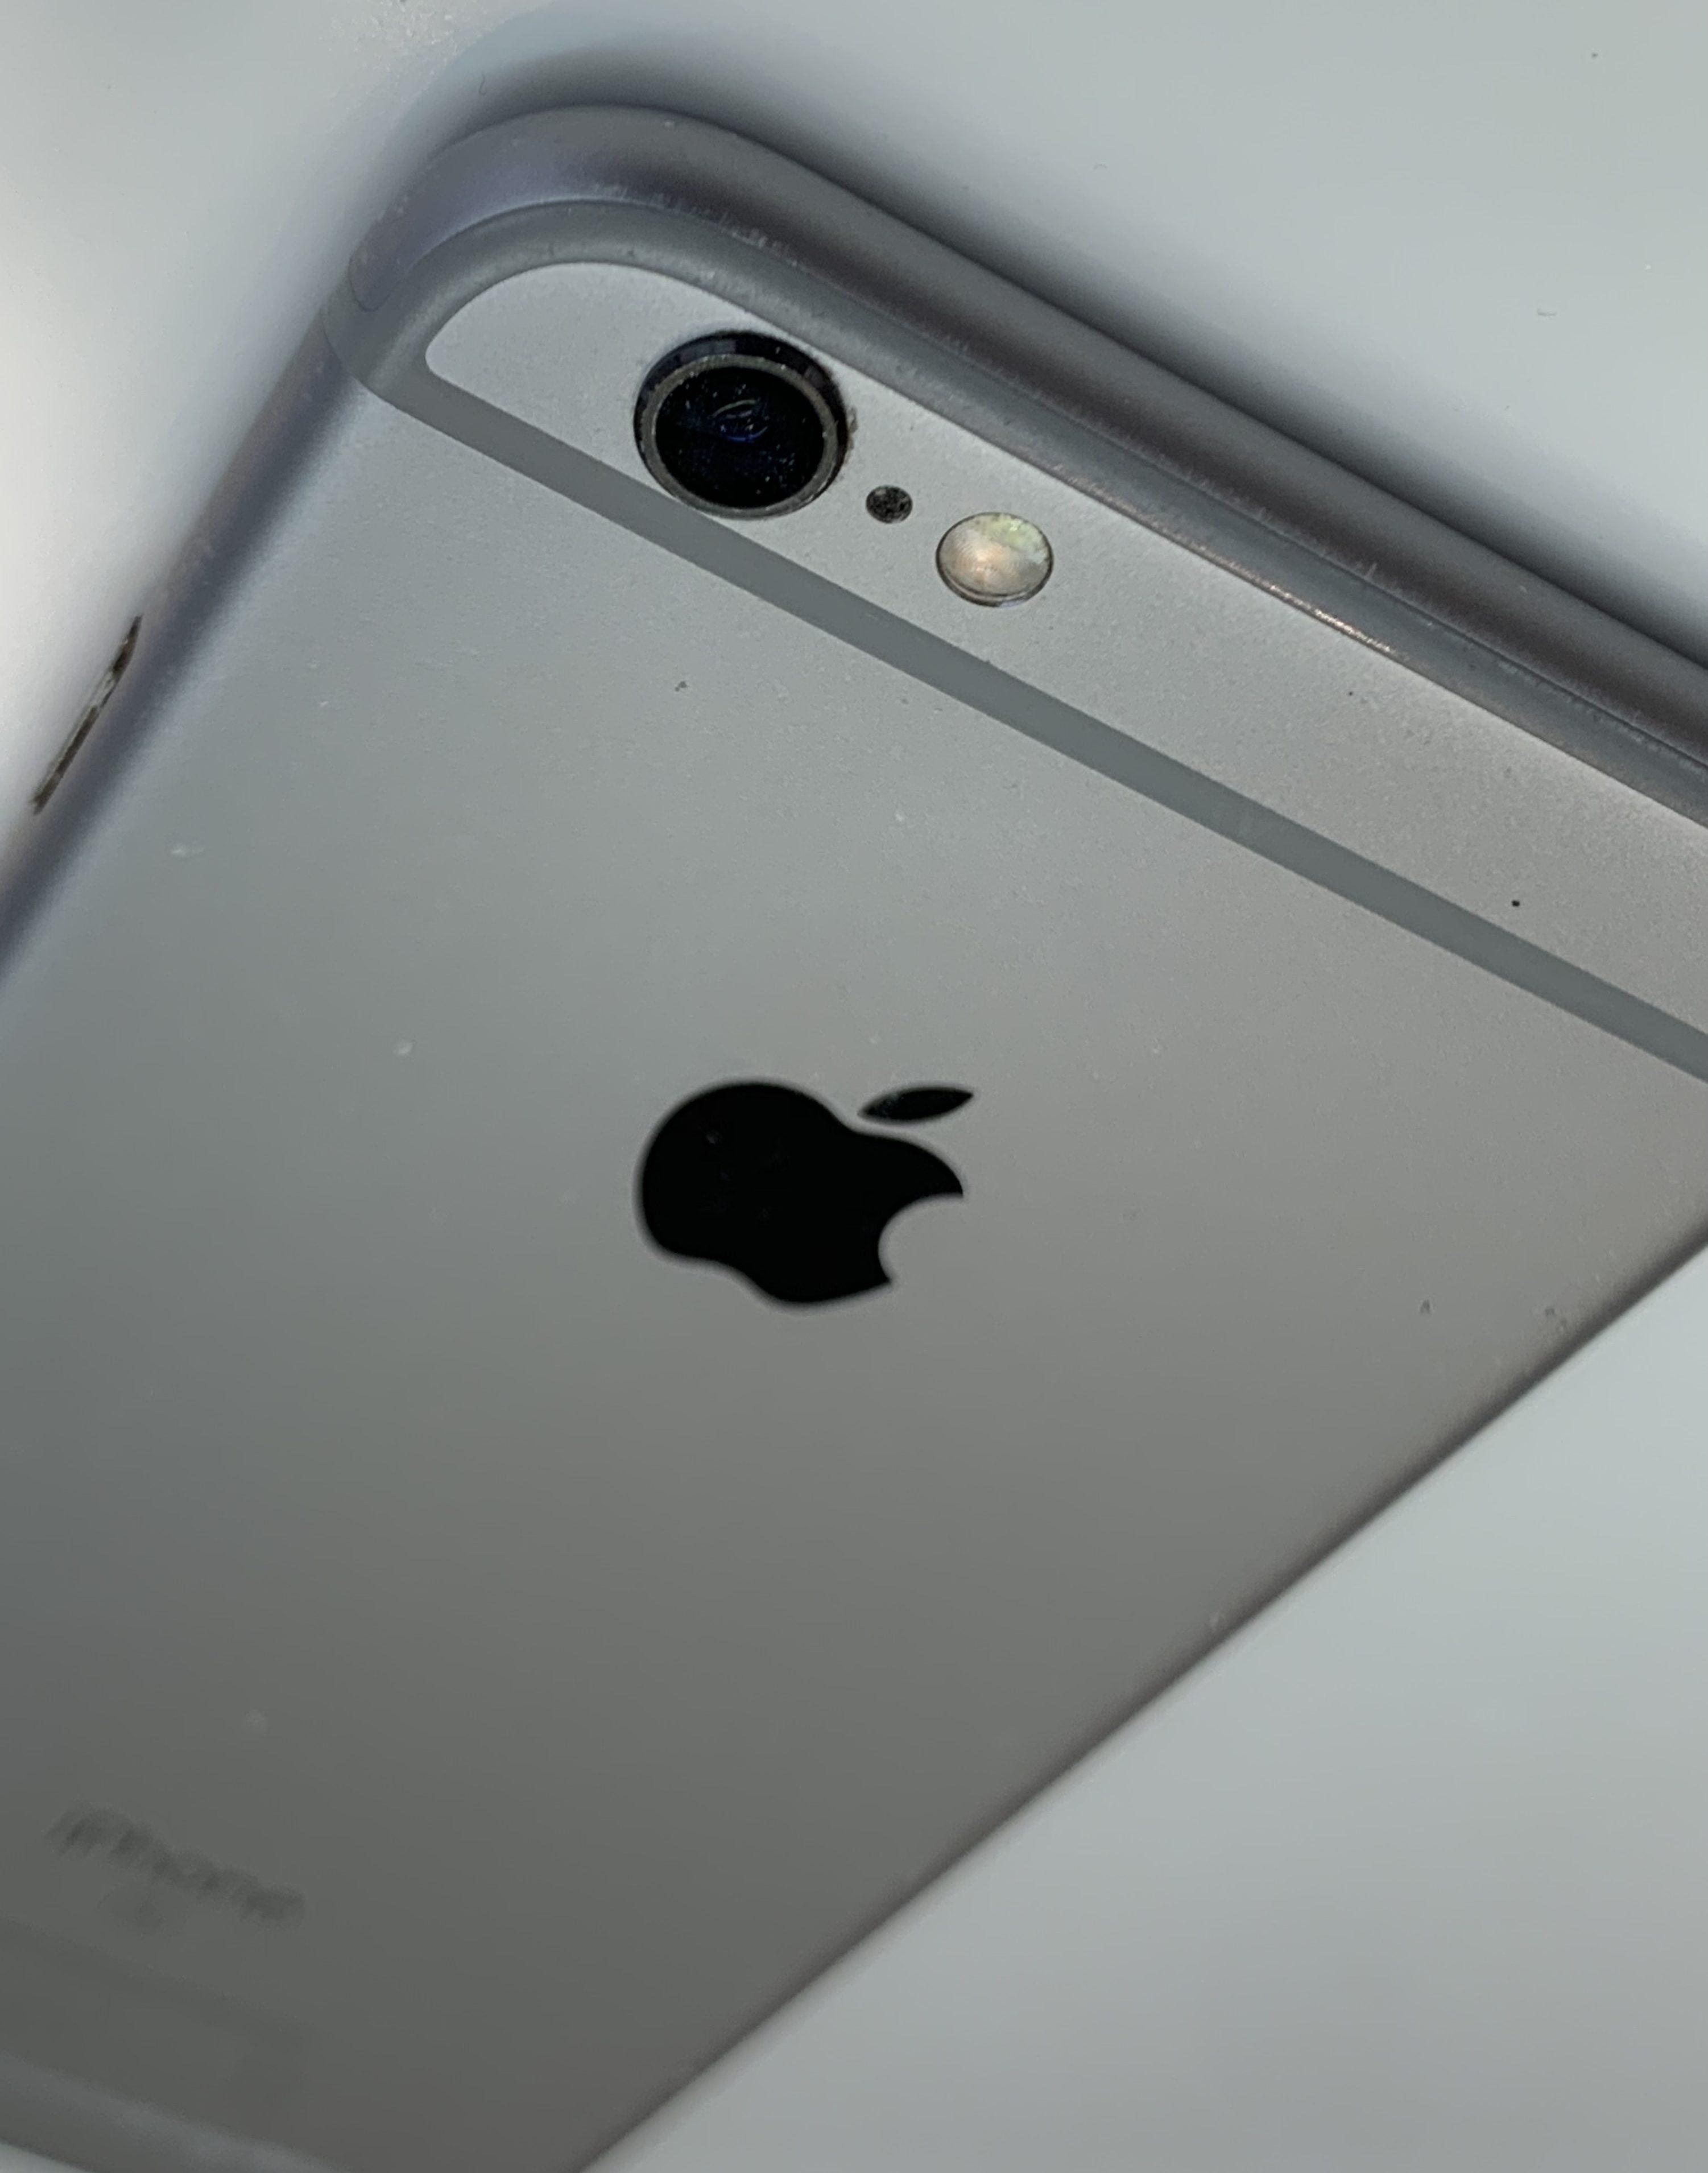 iPhone 6S 16GB, 16 GB, Space Gray, obraz 2